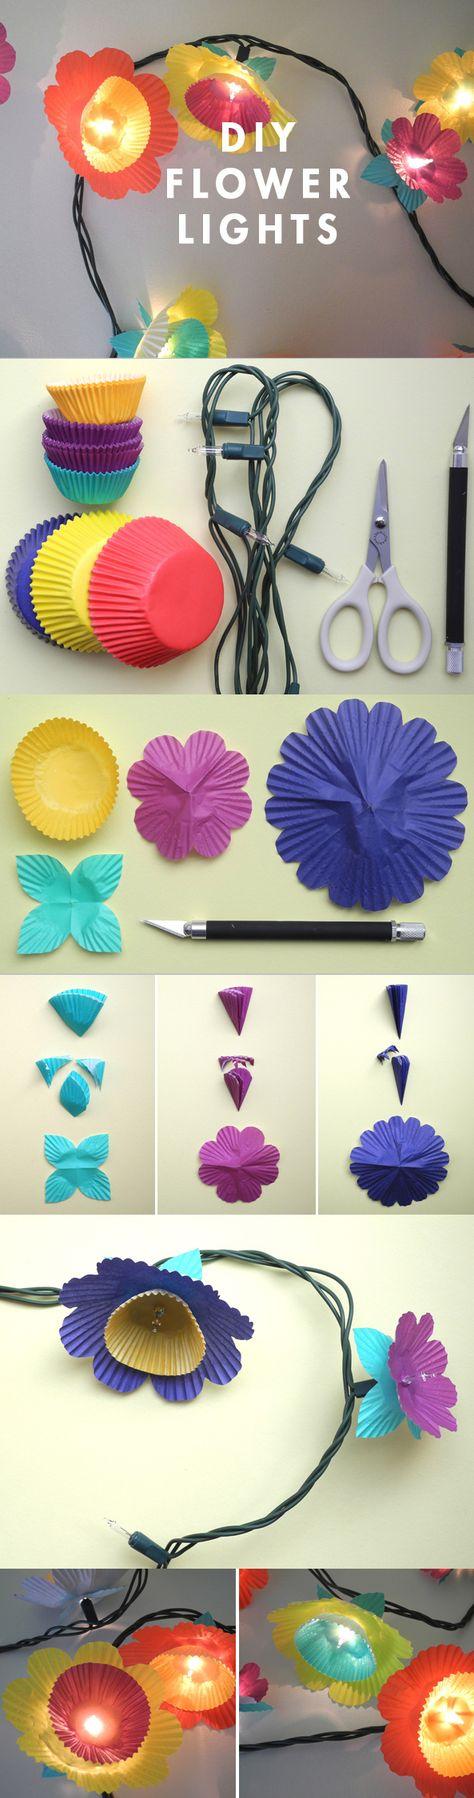 DIY cupcake liner flower lights -- tutorial by Steph Hung